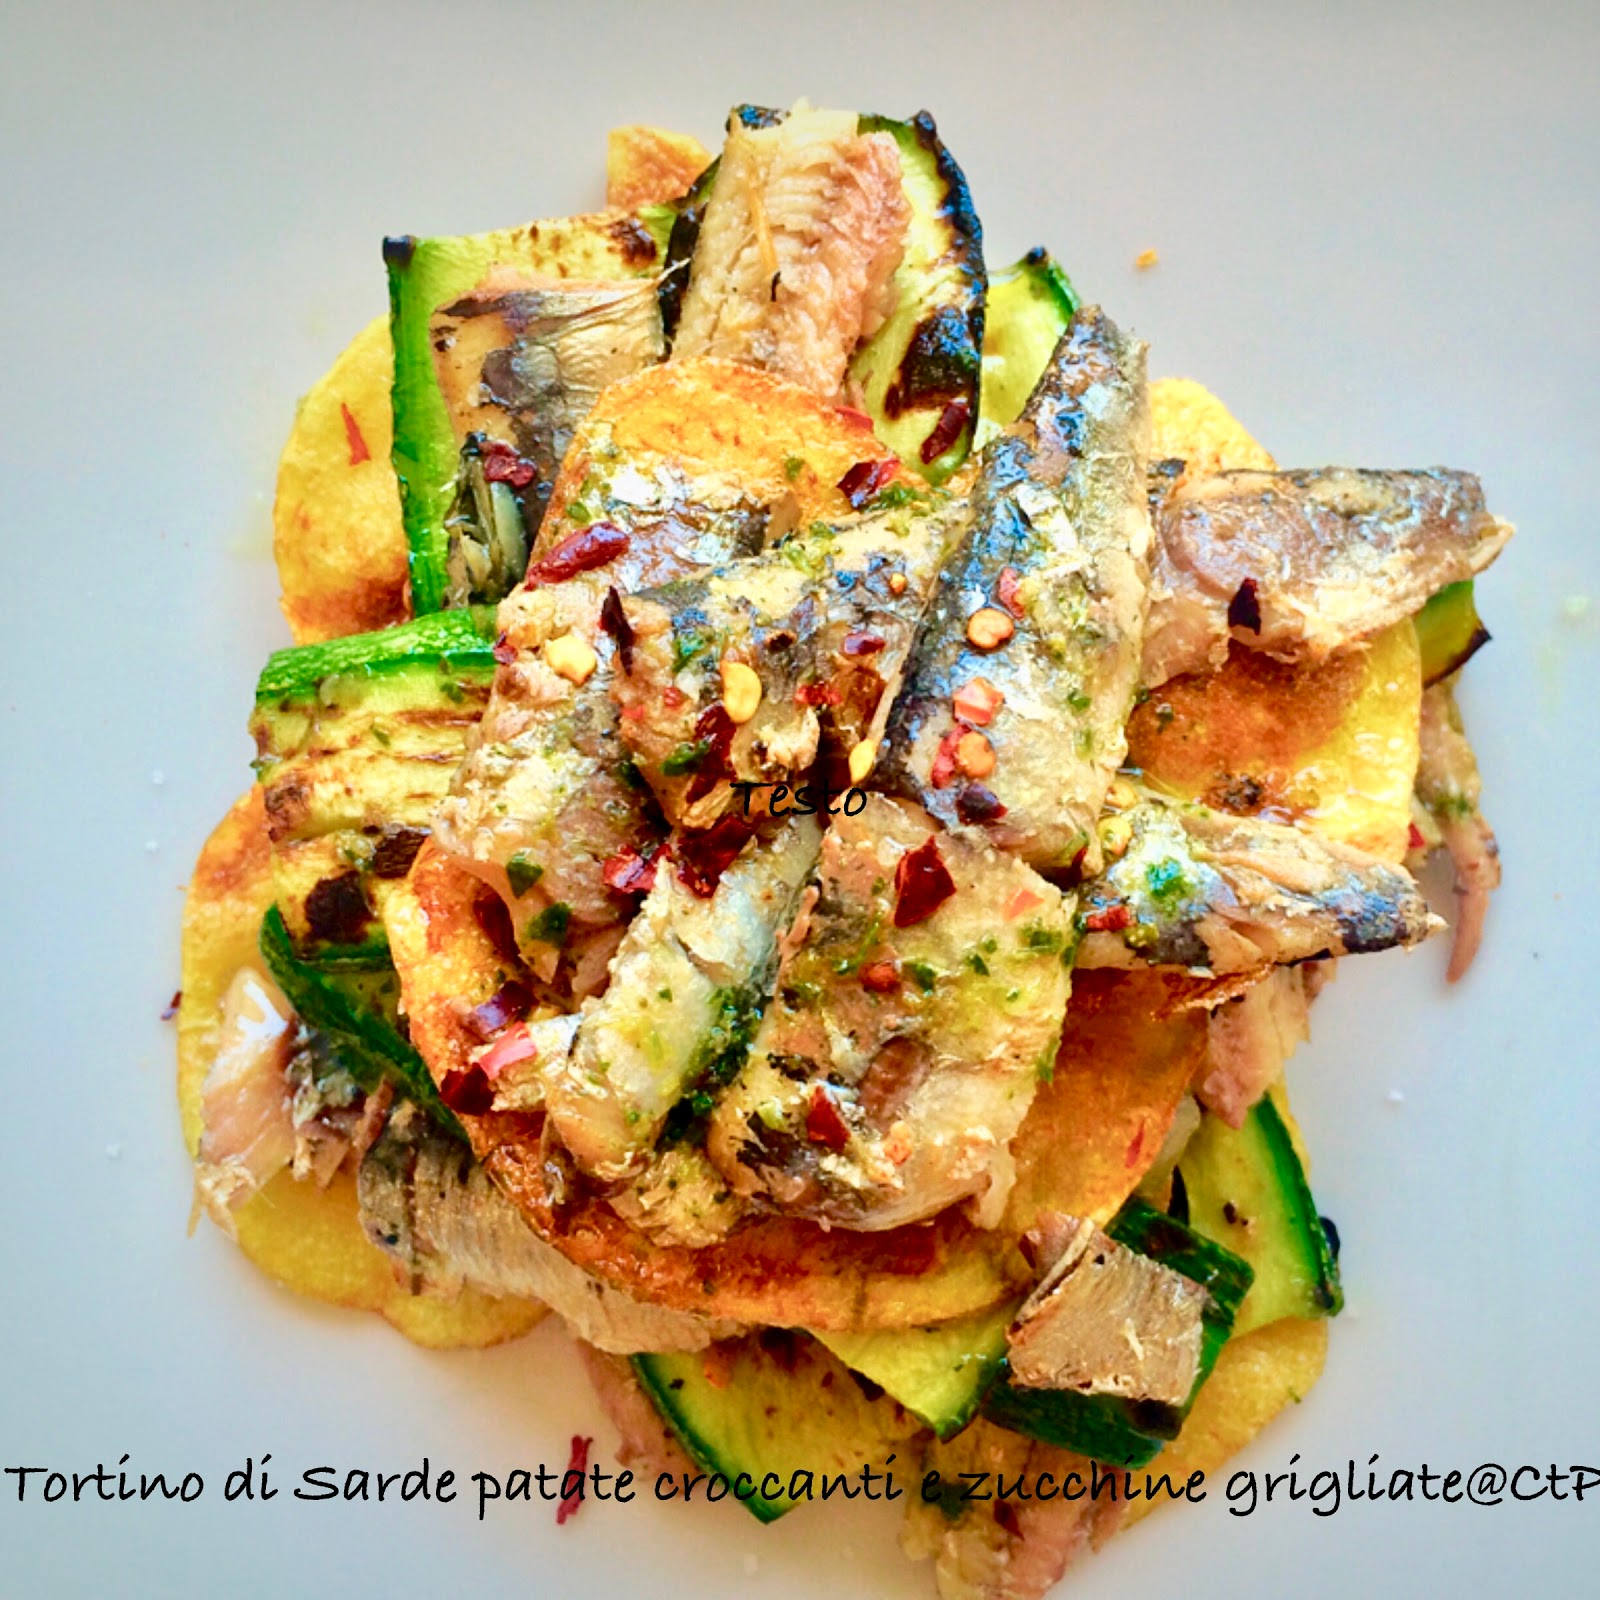 Tortino di Sarde con patate croccanti e zucchine grigliate alessandra ruggeri